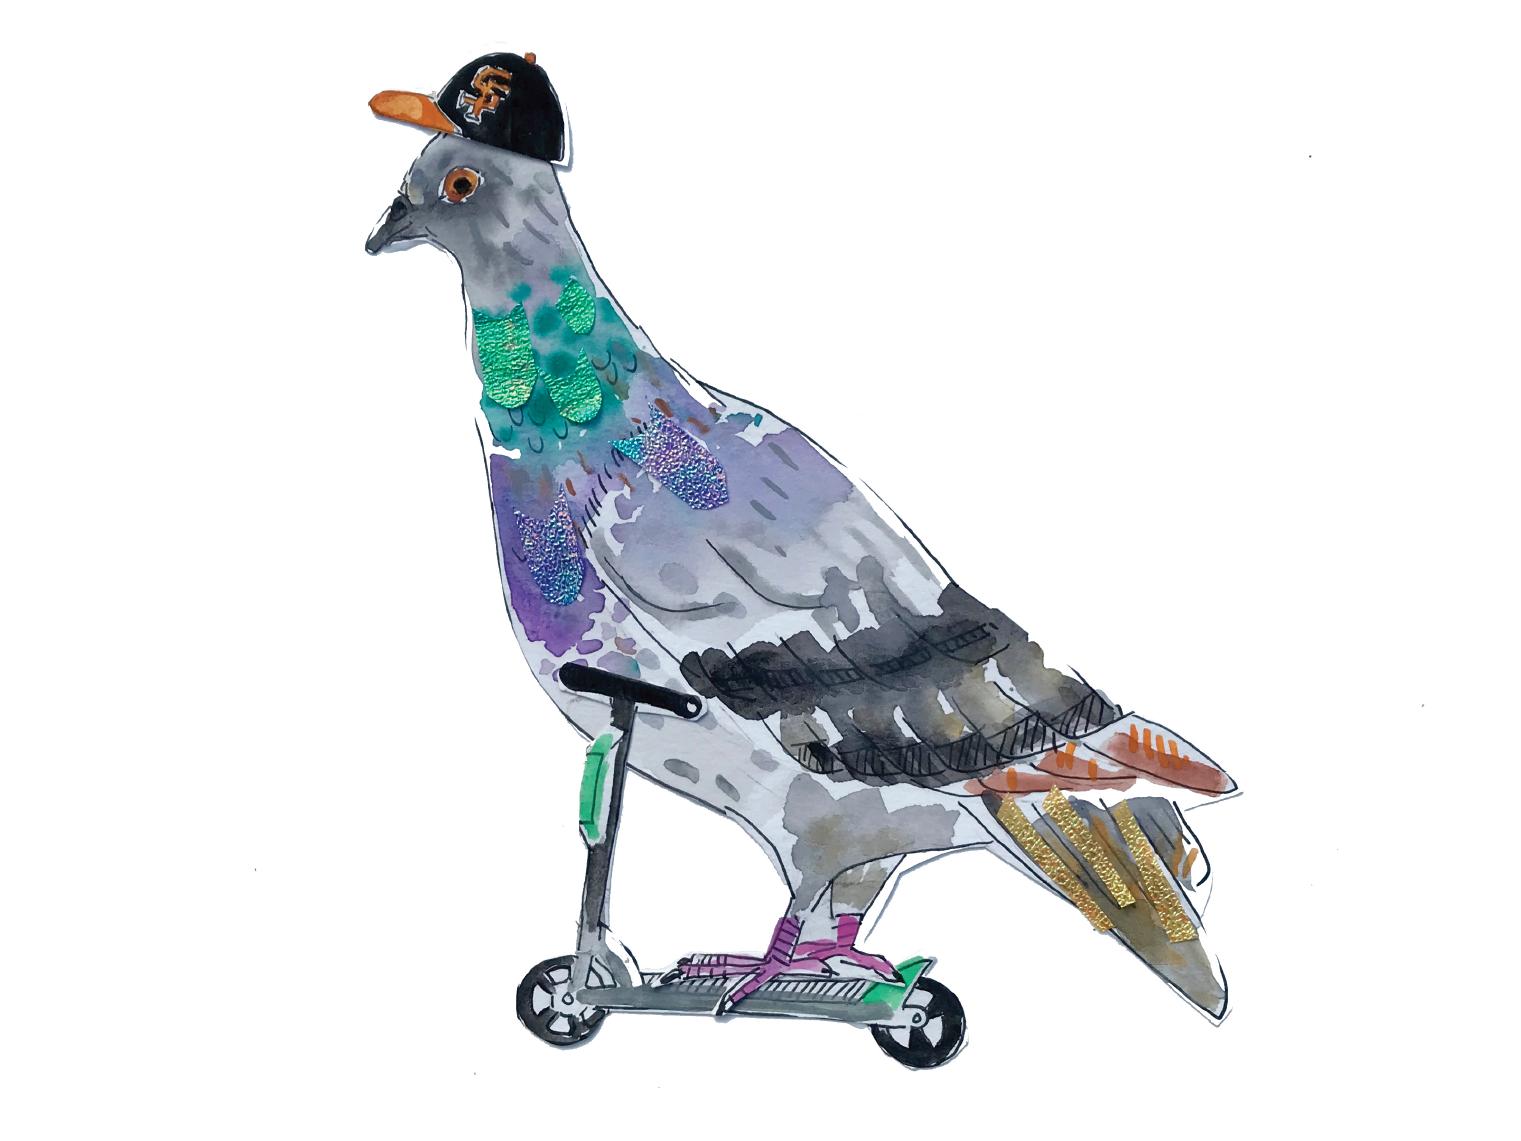 San Francisco Resident (pigeon) by Maria Gabriela Sanchez Mallona on